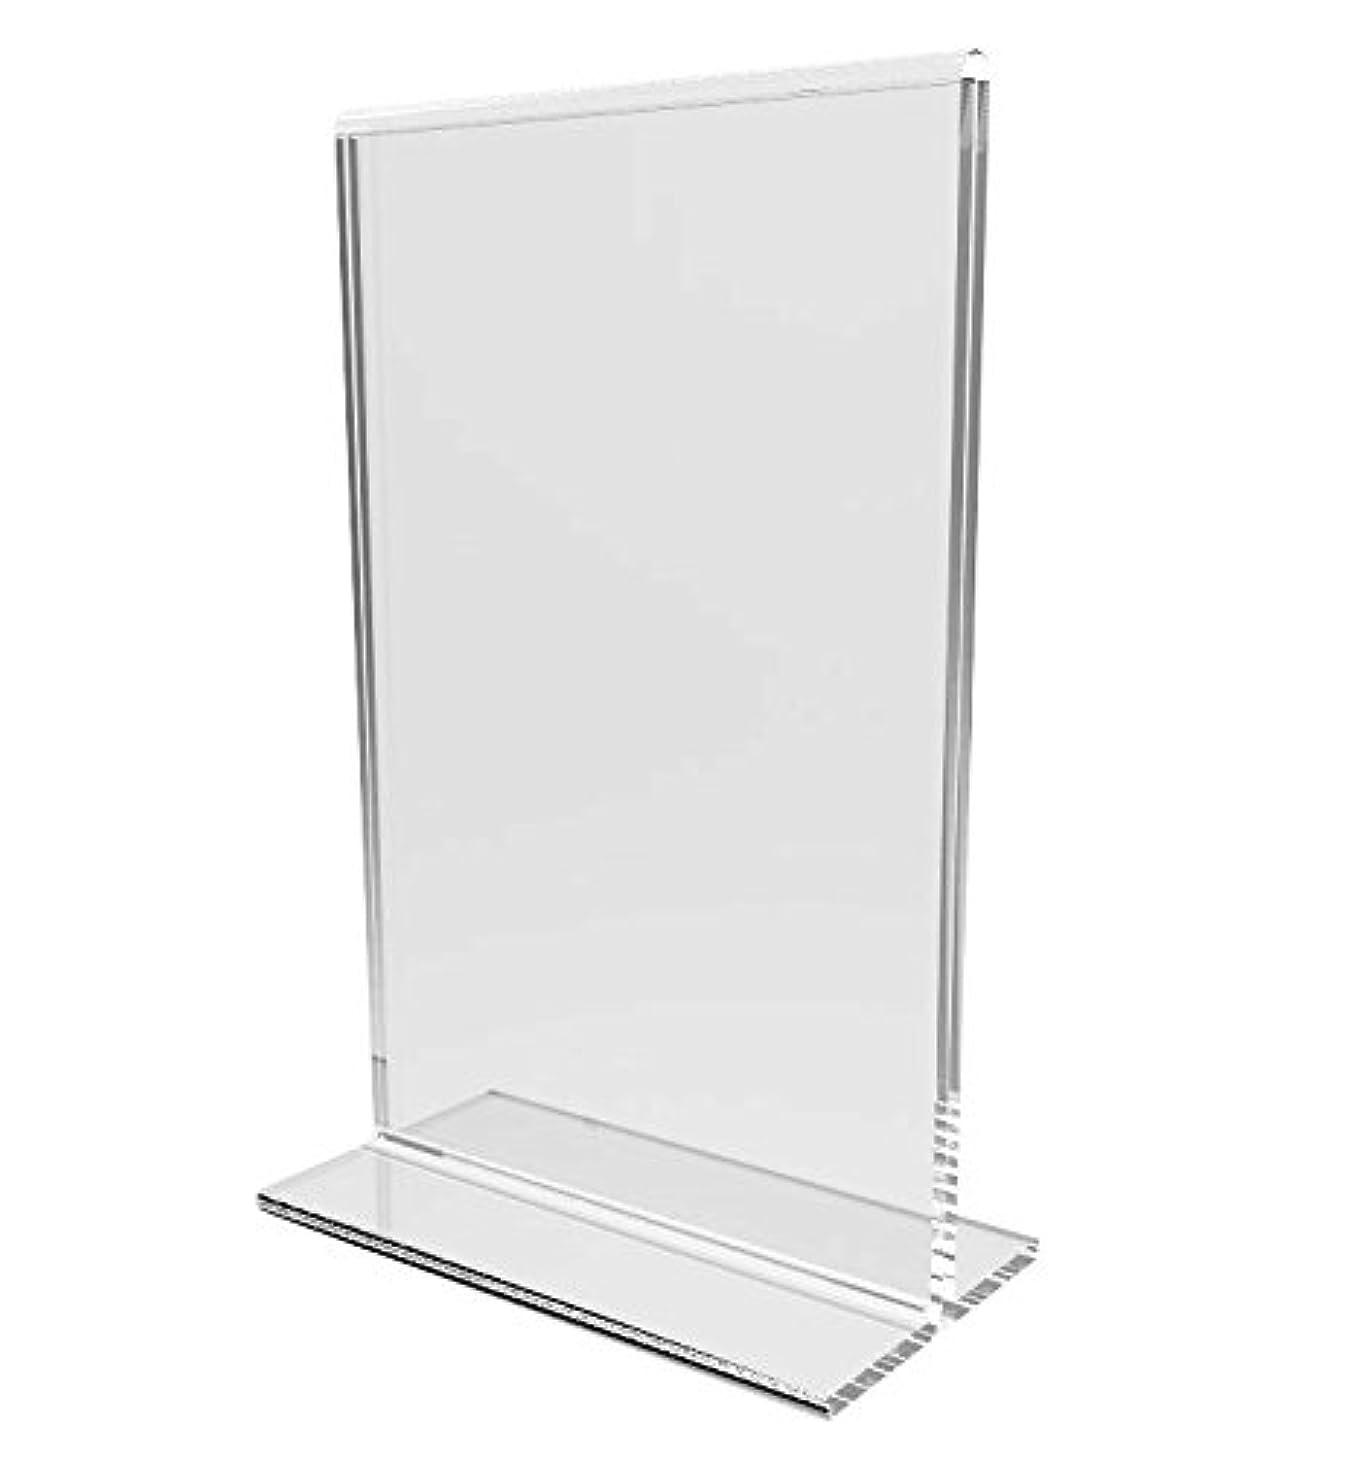 FixtureDisplays 24-Pack Clear Acrylic 4x6